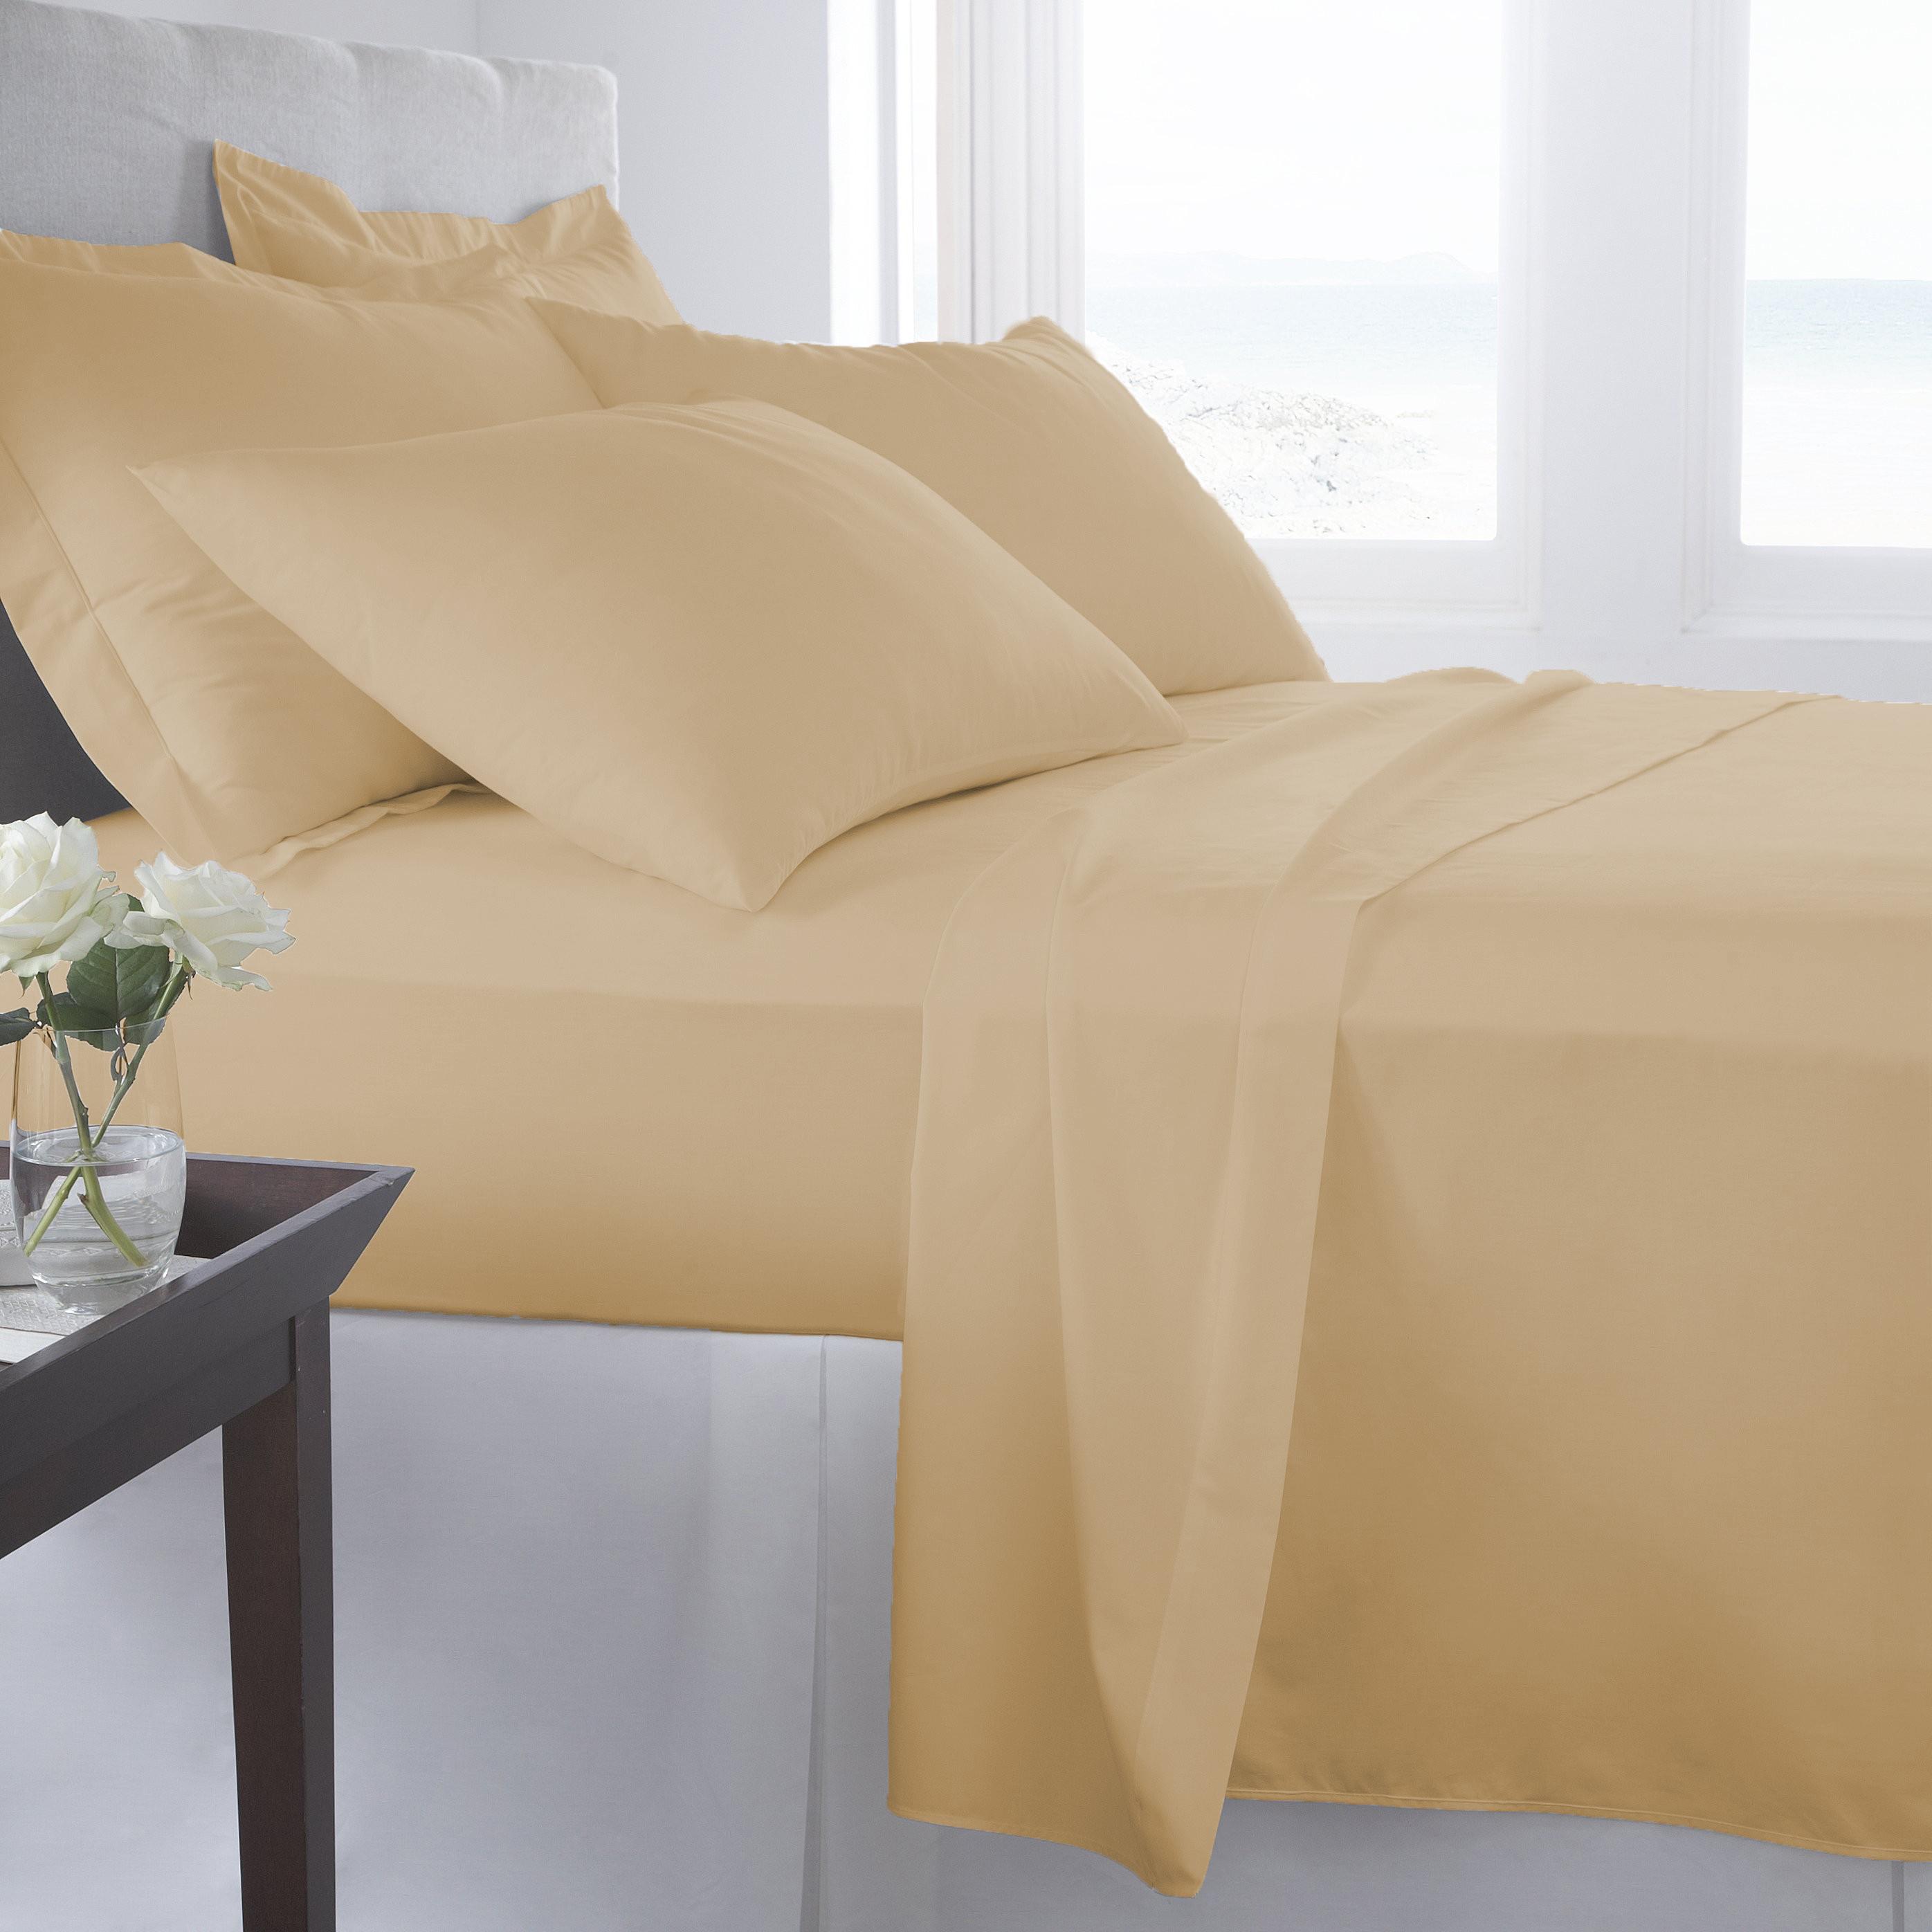 Supreme-Super-Soft-4-Piece-Bed-Sheet-Set-Deep-Pocket-Bedding-All-Colors-Sizes thumbnail 20